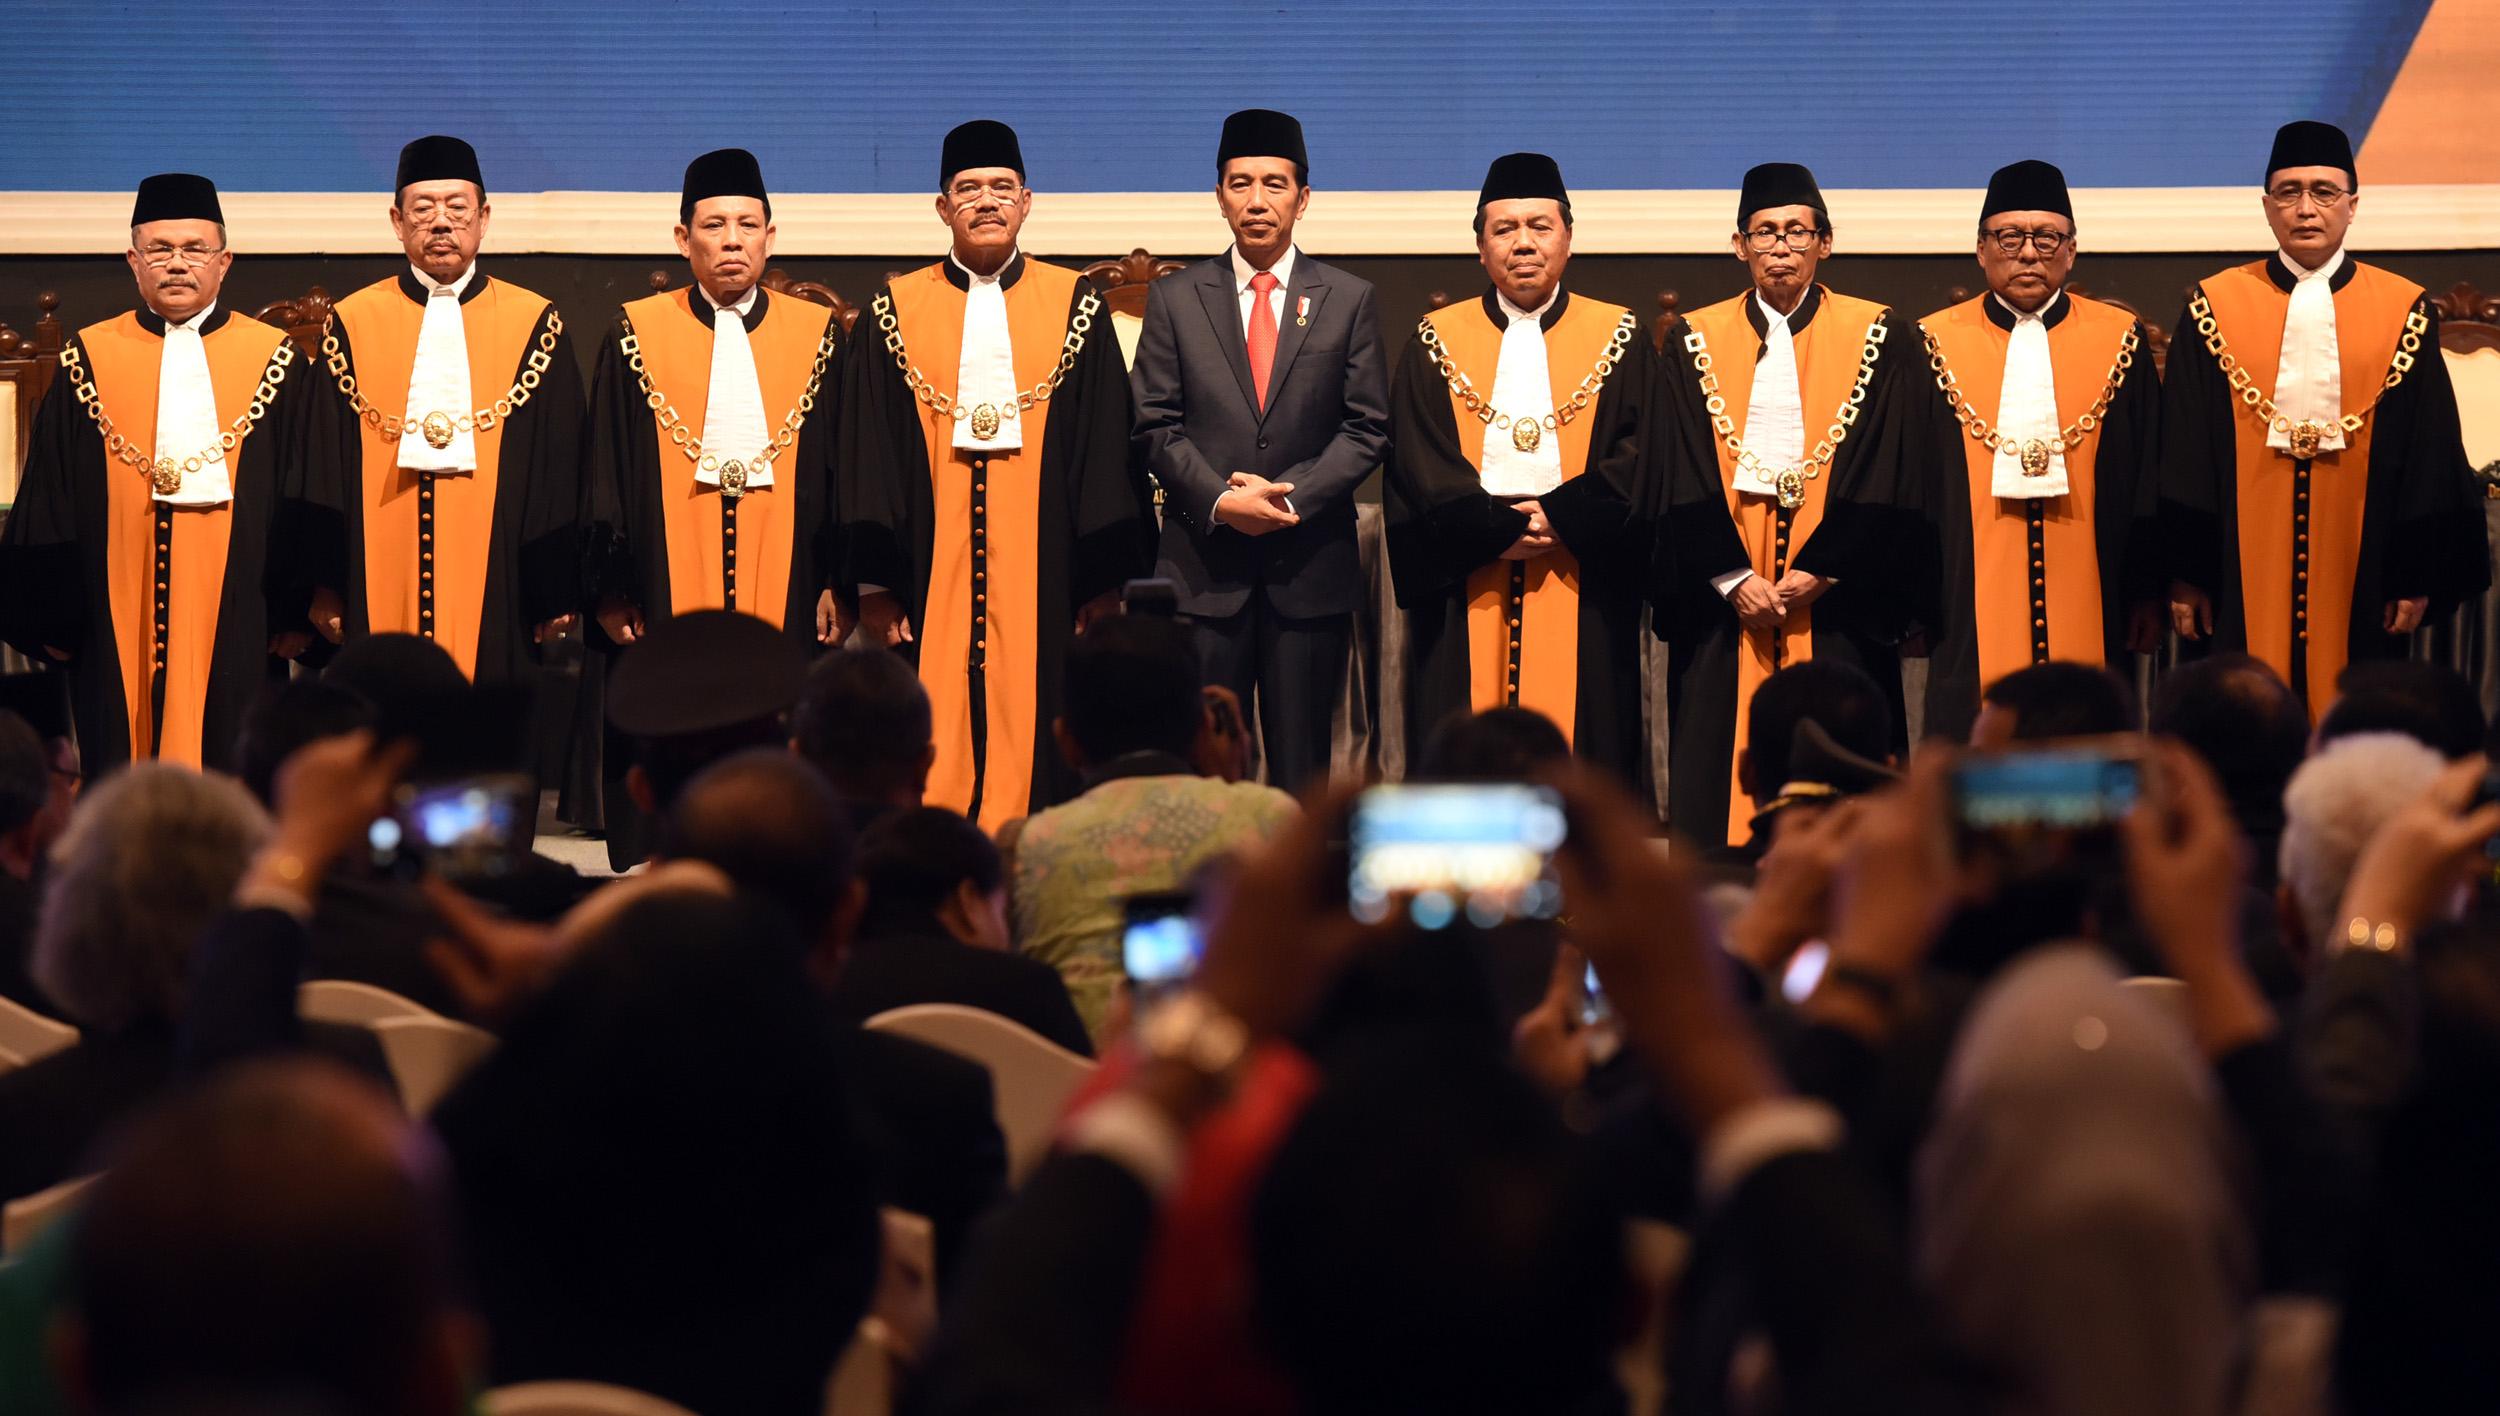 President Jokowi Supports Severe Punishments for Corruptors, Drug